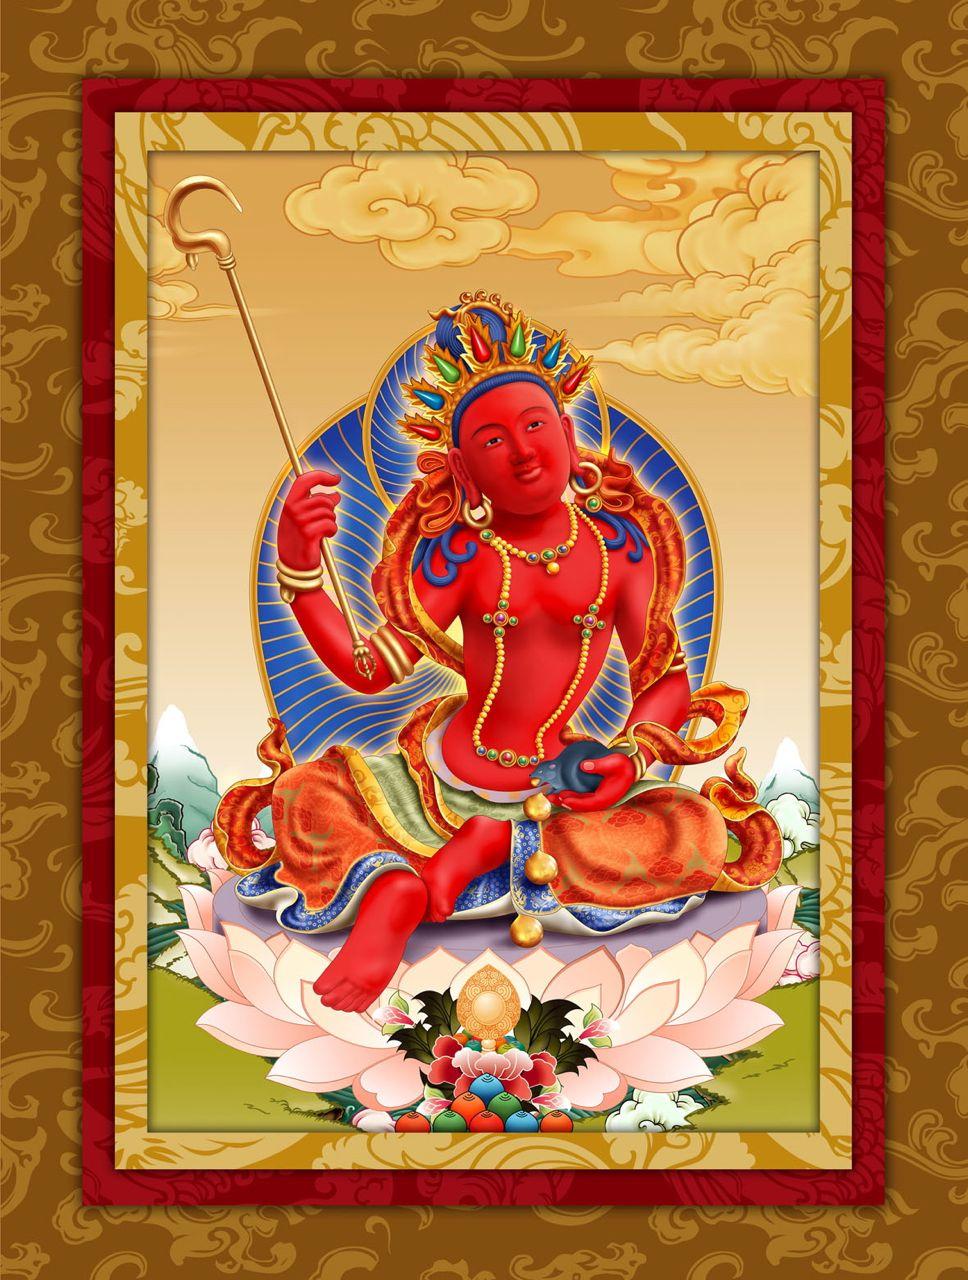 Namo Red Manohara Vasudhara Purification, Blessings, Enrichment, Bardo Fire Homa Ceremony